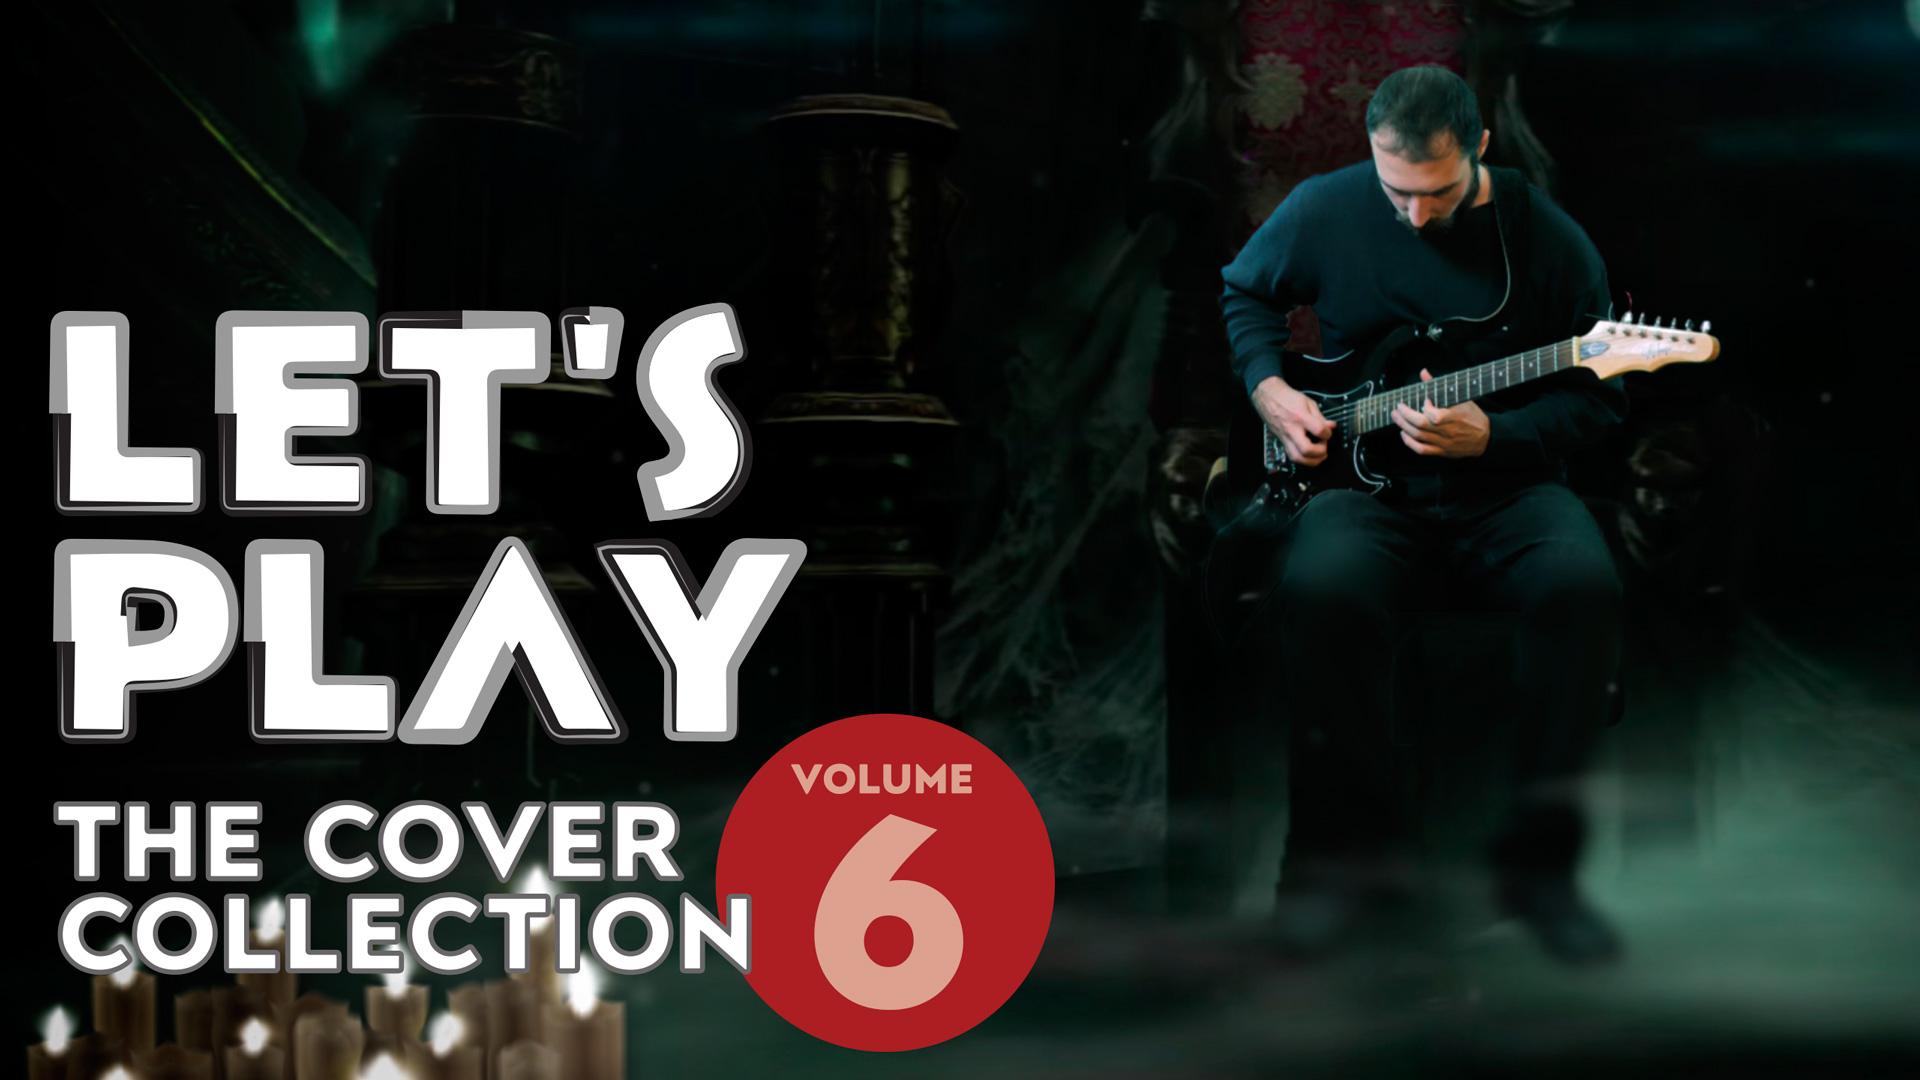 Castlevania II – Bloody Tears (Flamenco/Rock Cover)